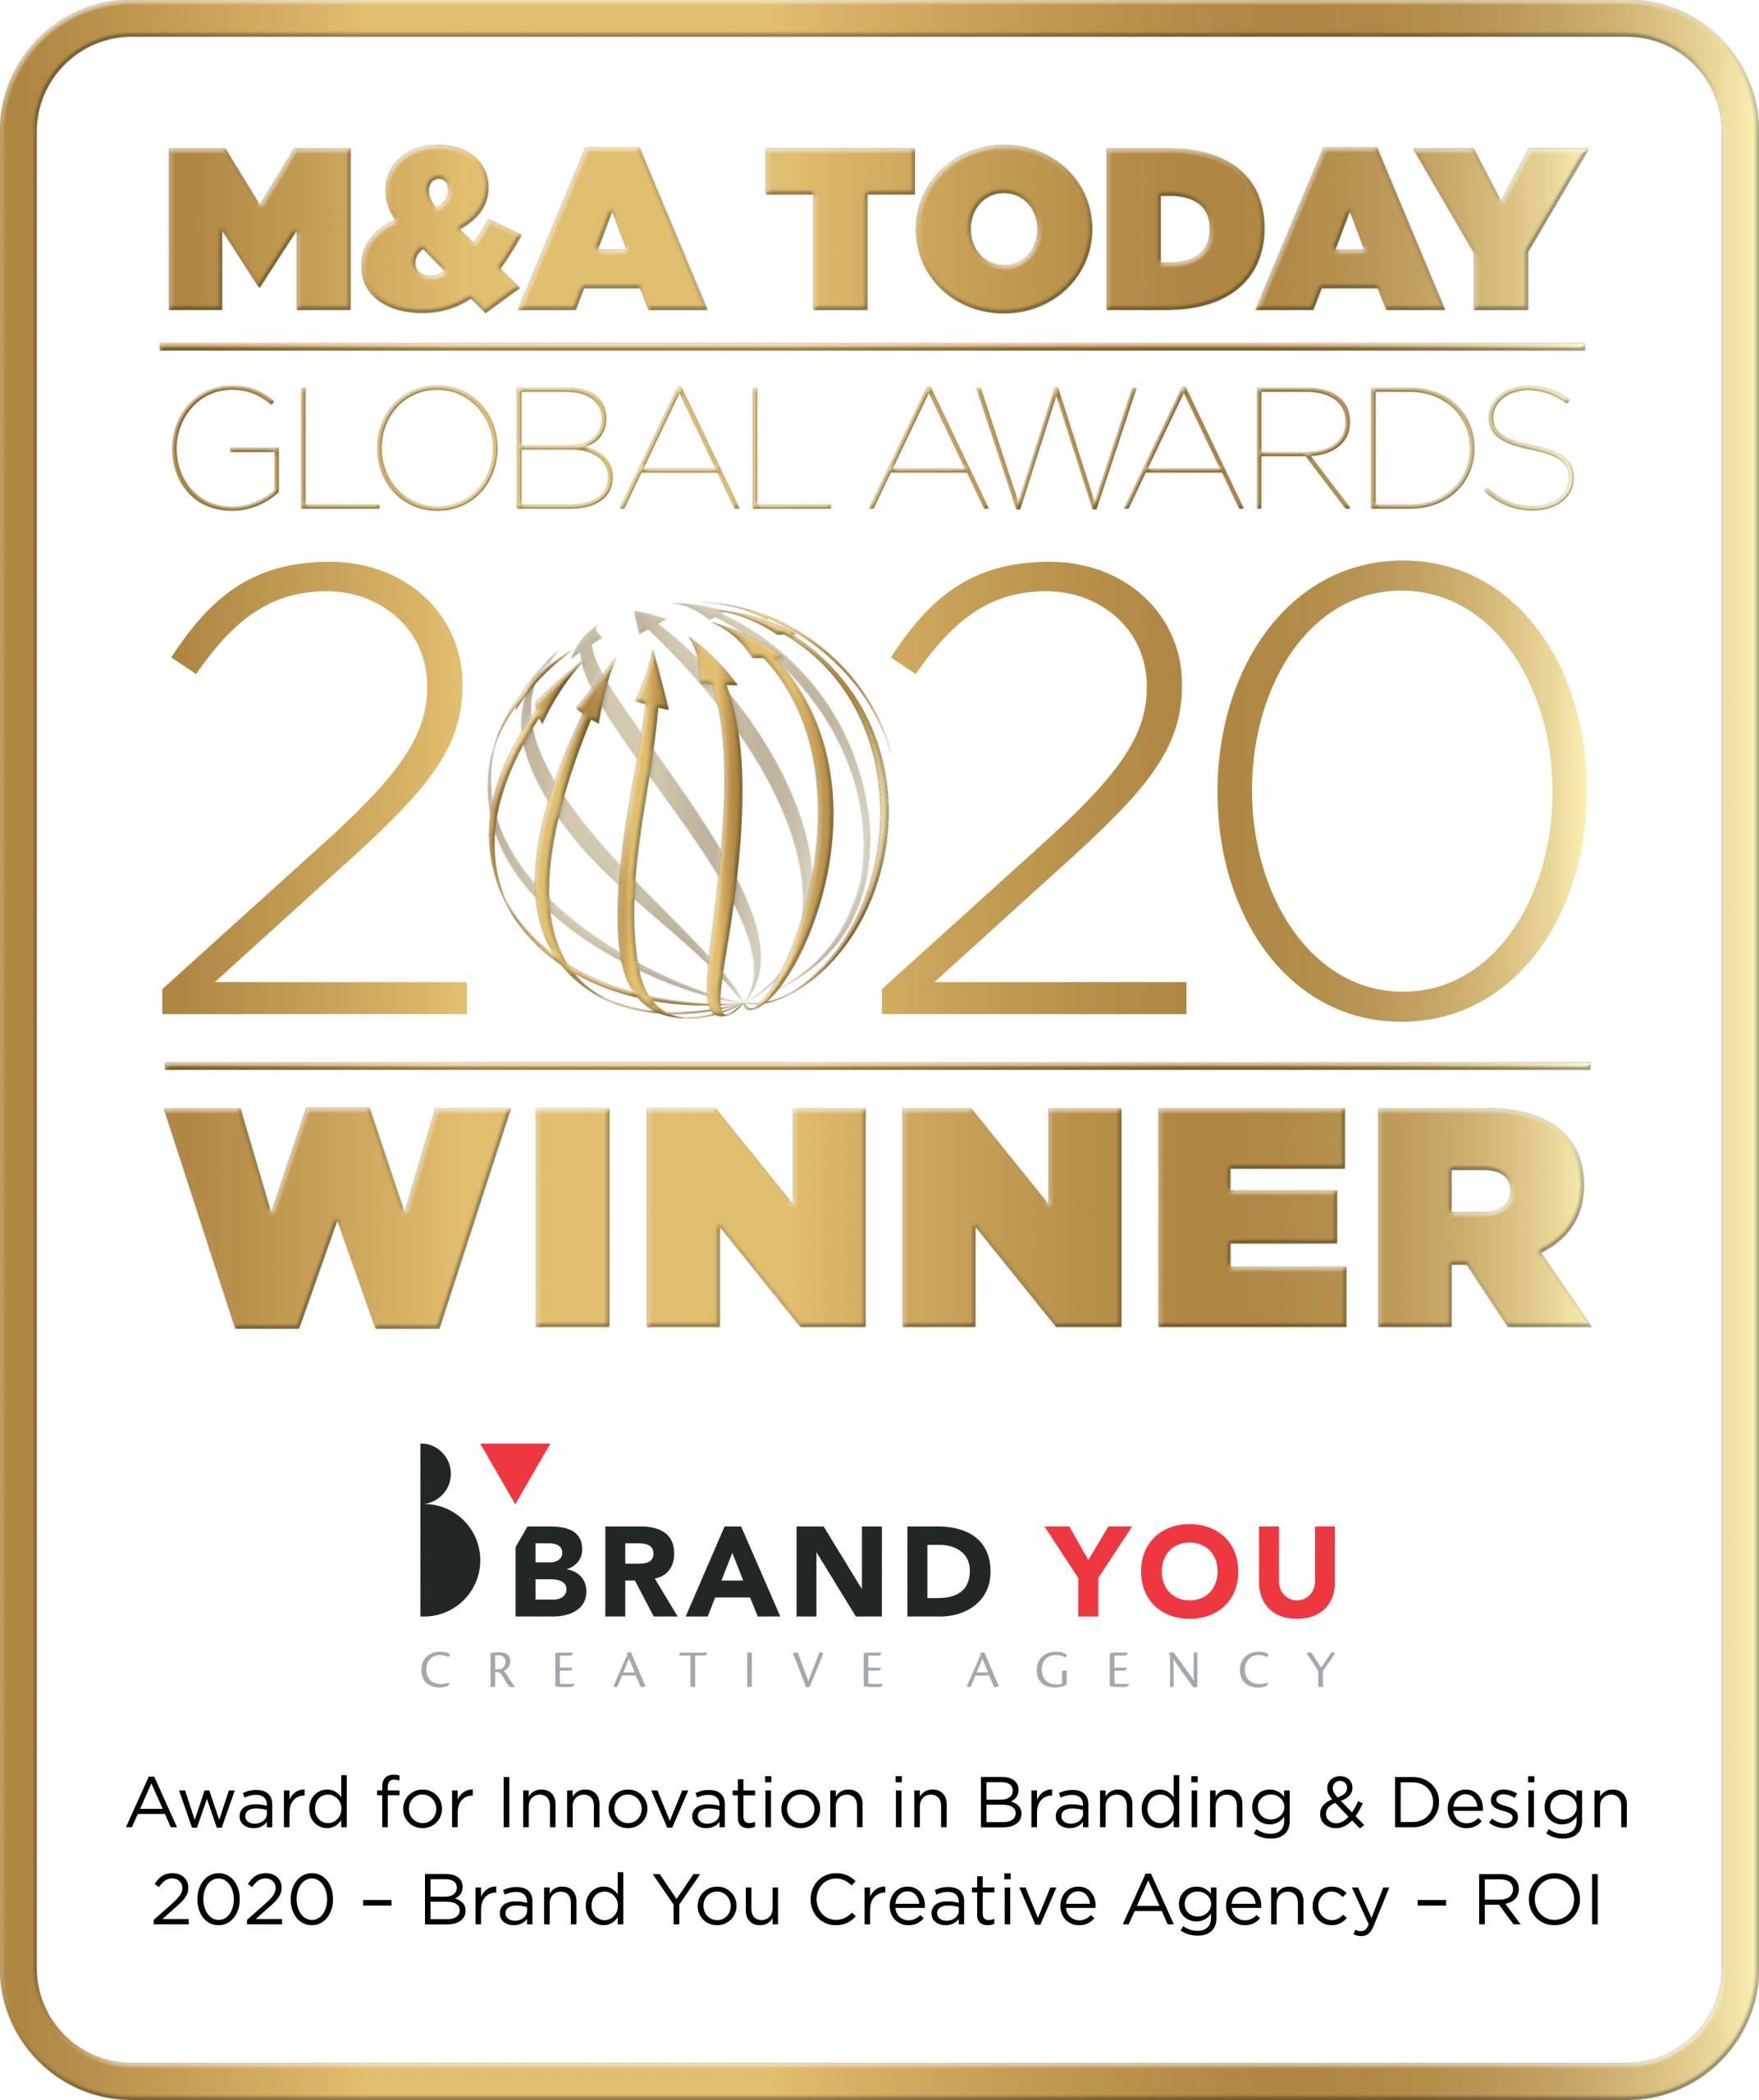 MA-Today-Global-Awards-logo-2020_Brand-You-Creative-Agency_v2